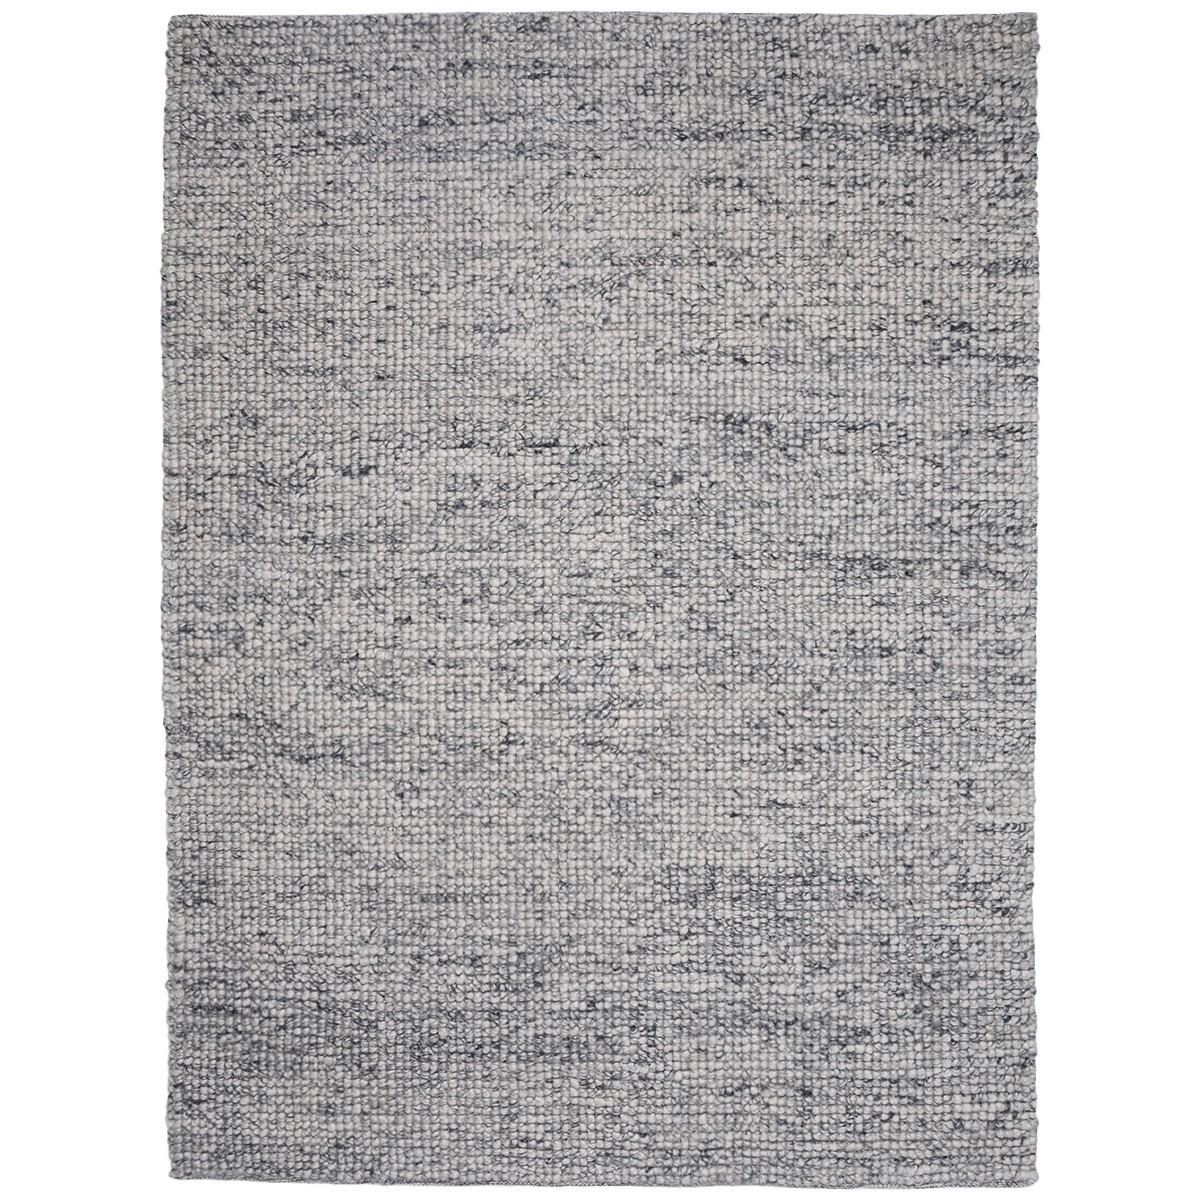 Modern Berber Handwoven Wool Rug, 160x120cm, Hotham